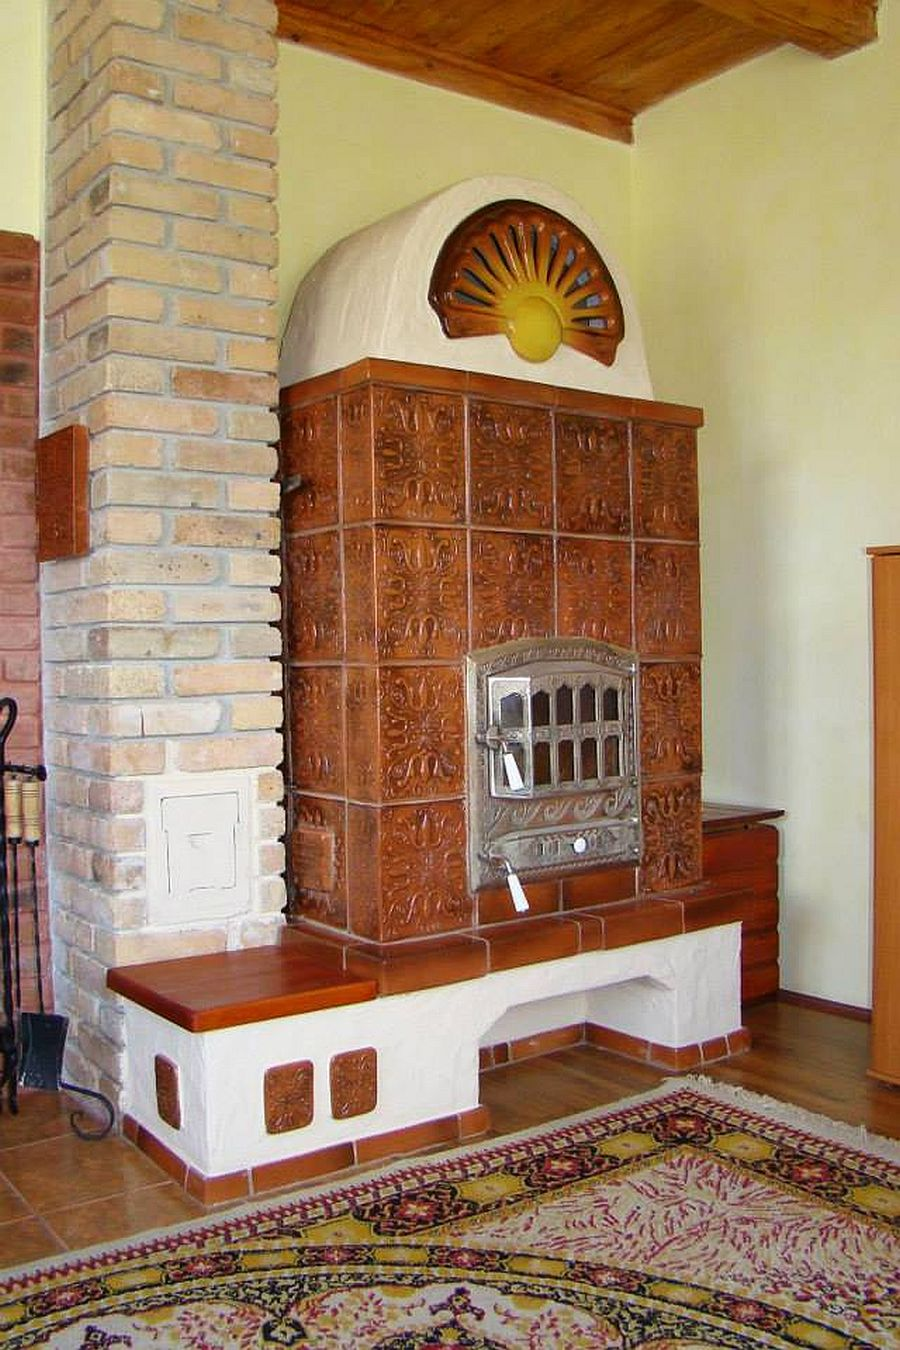 adelaparvu.com despre sobe, semineuri, gratare cu cahle de teracota si cahle pictate, Design AMRITA, Tg Secuiesc, Romania (13)